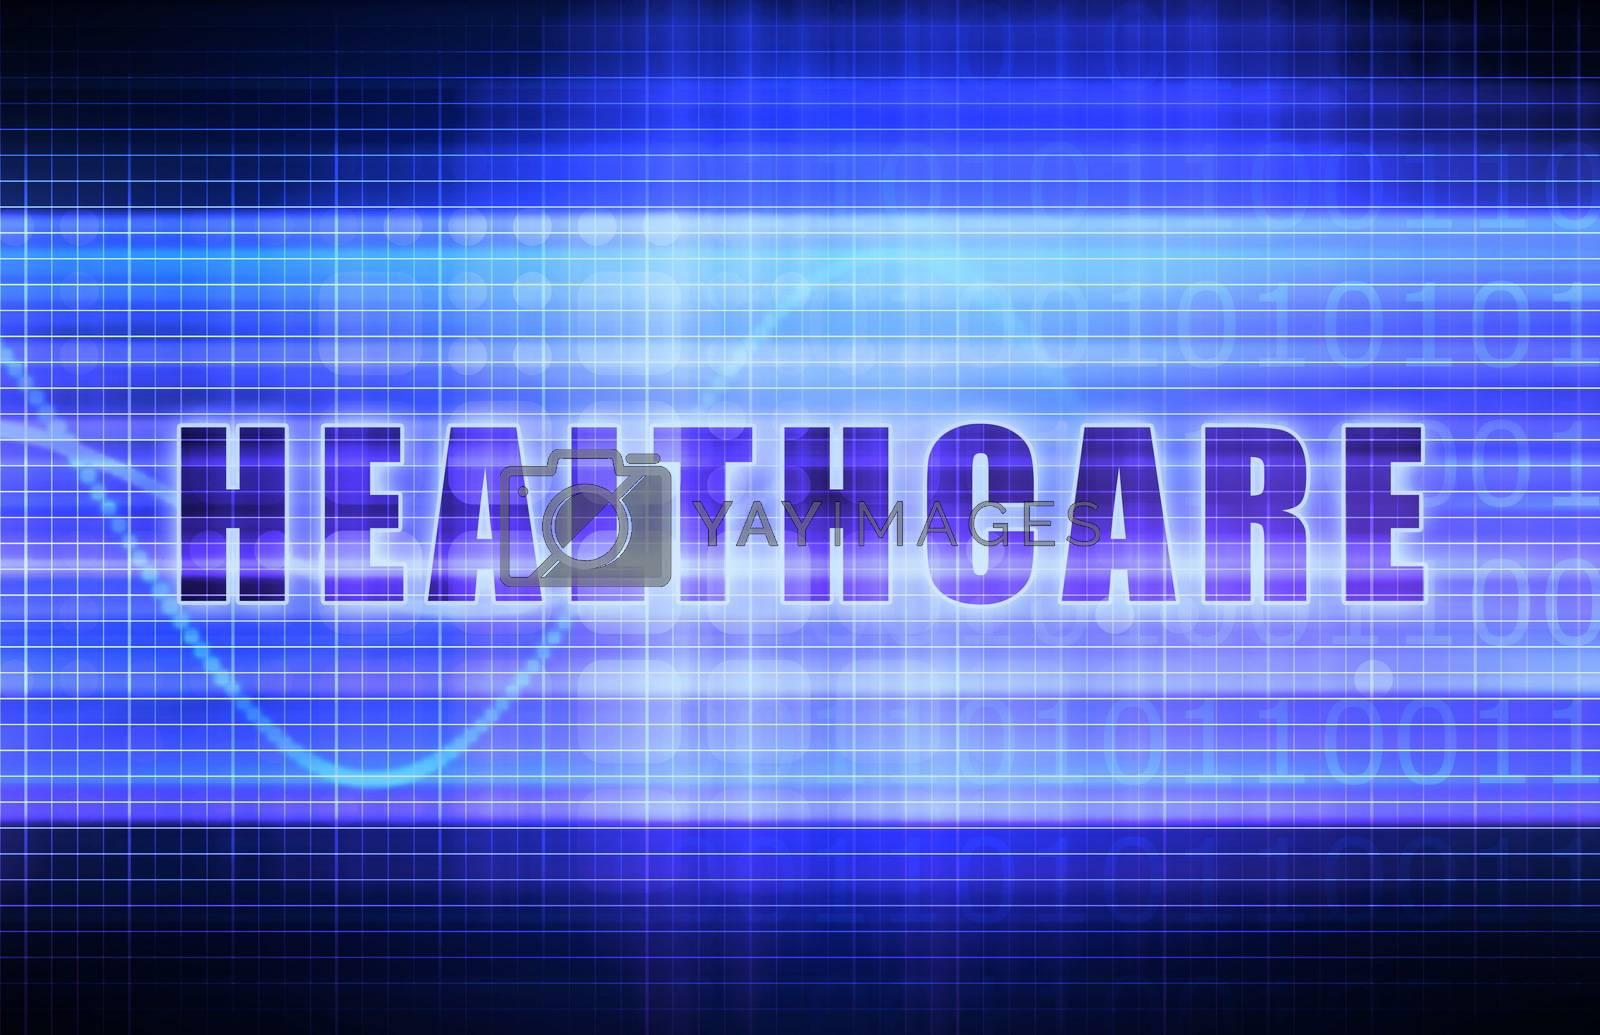 Healthcare on a Tech Business Chart Art